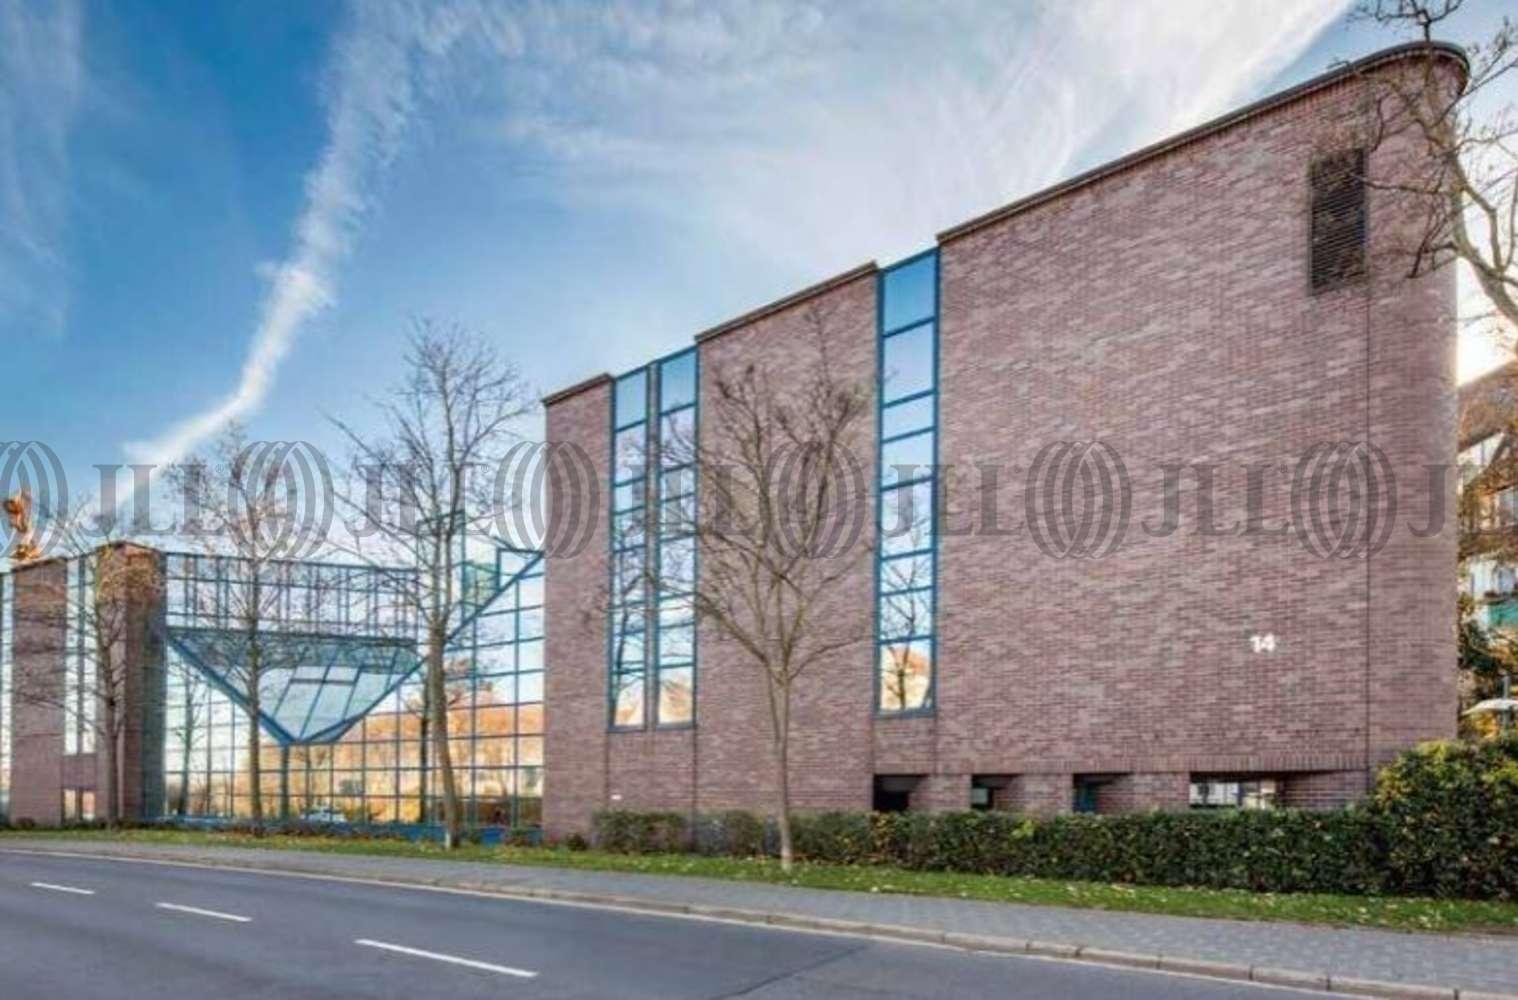 Büros Nürnberg, 90491 - Büro - Nürnberg - M1621 - 10604811